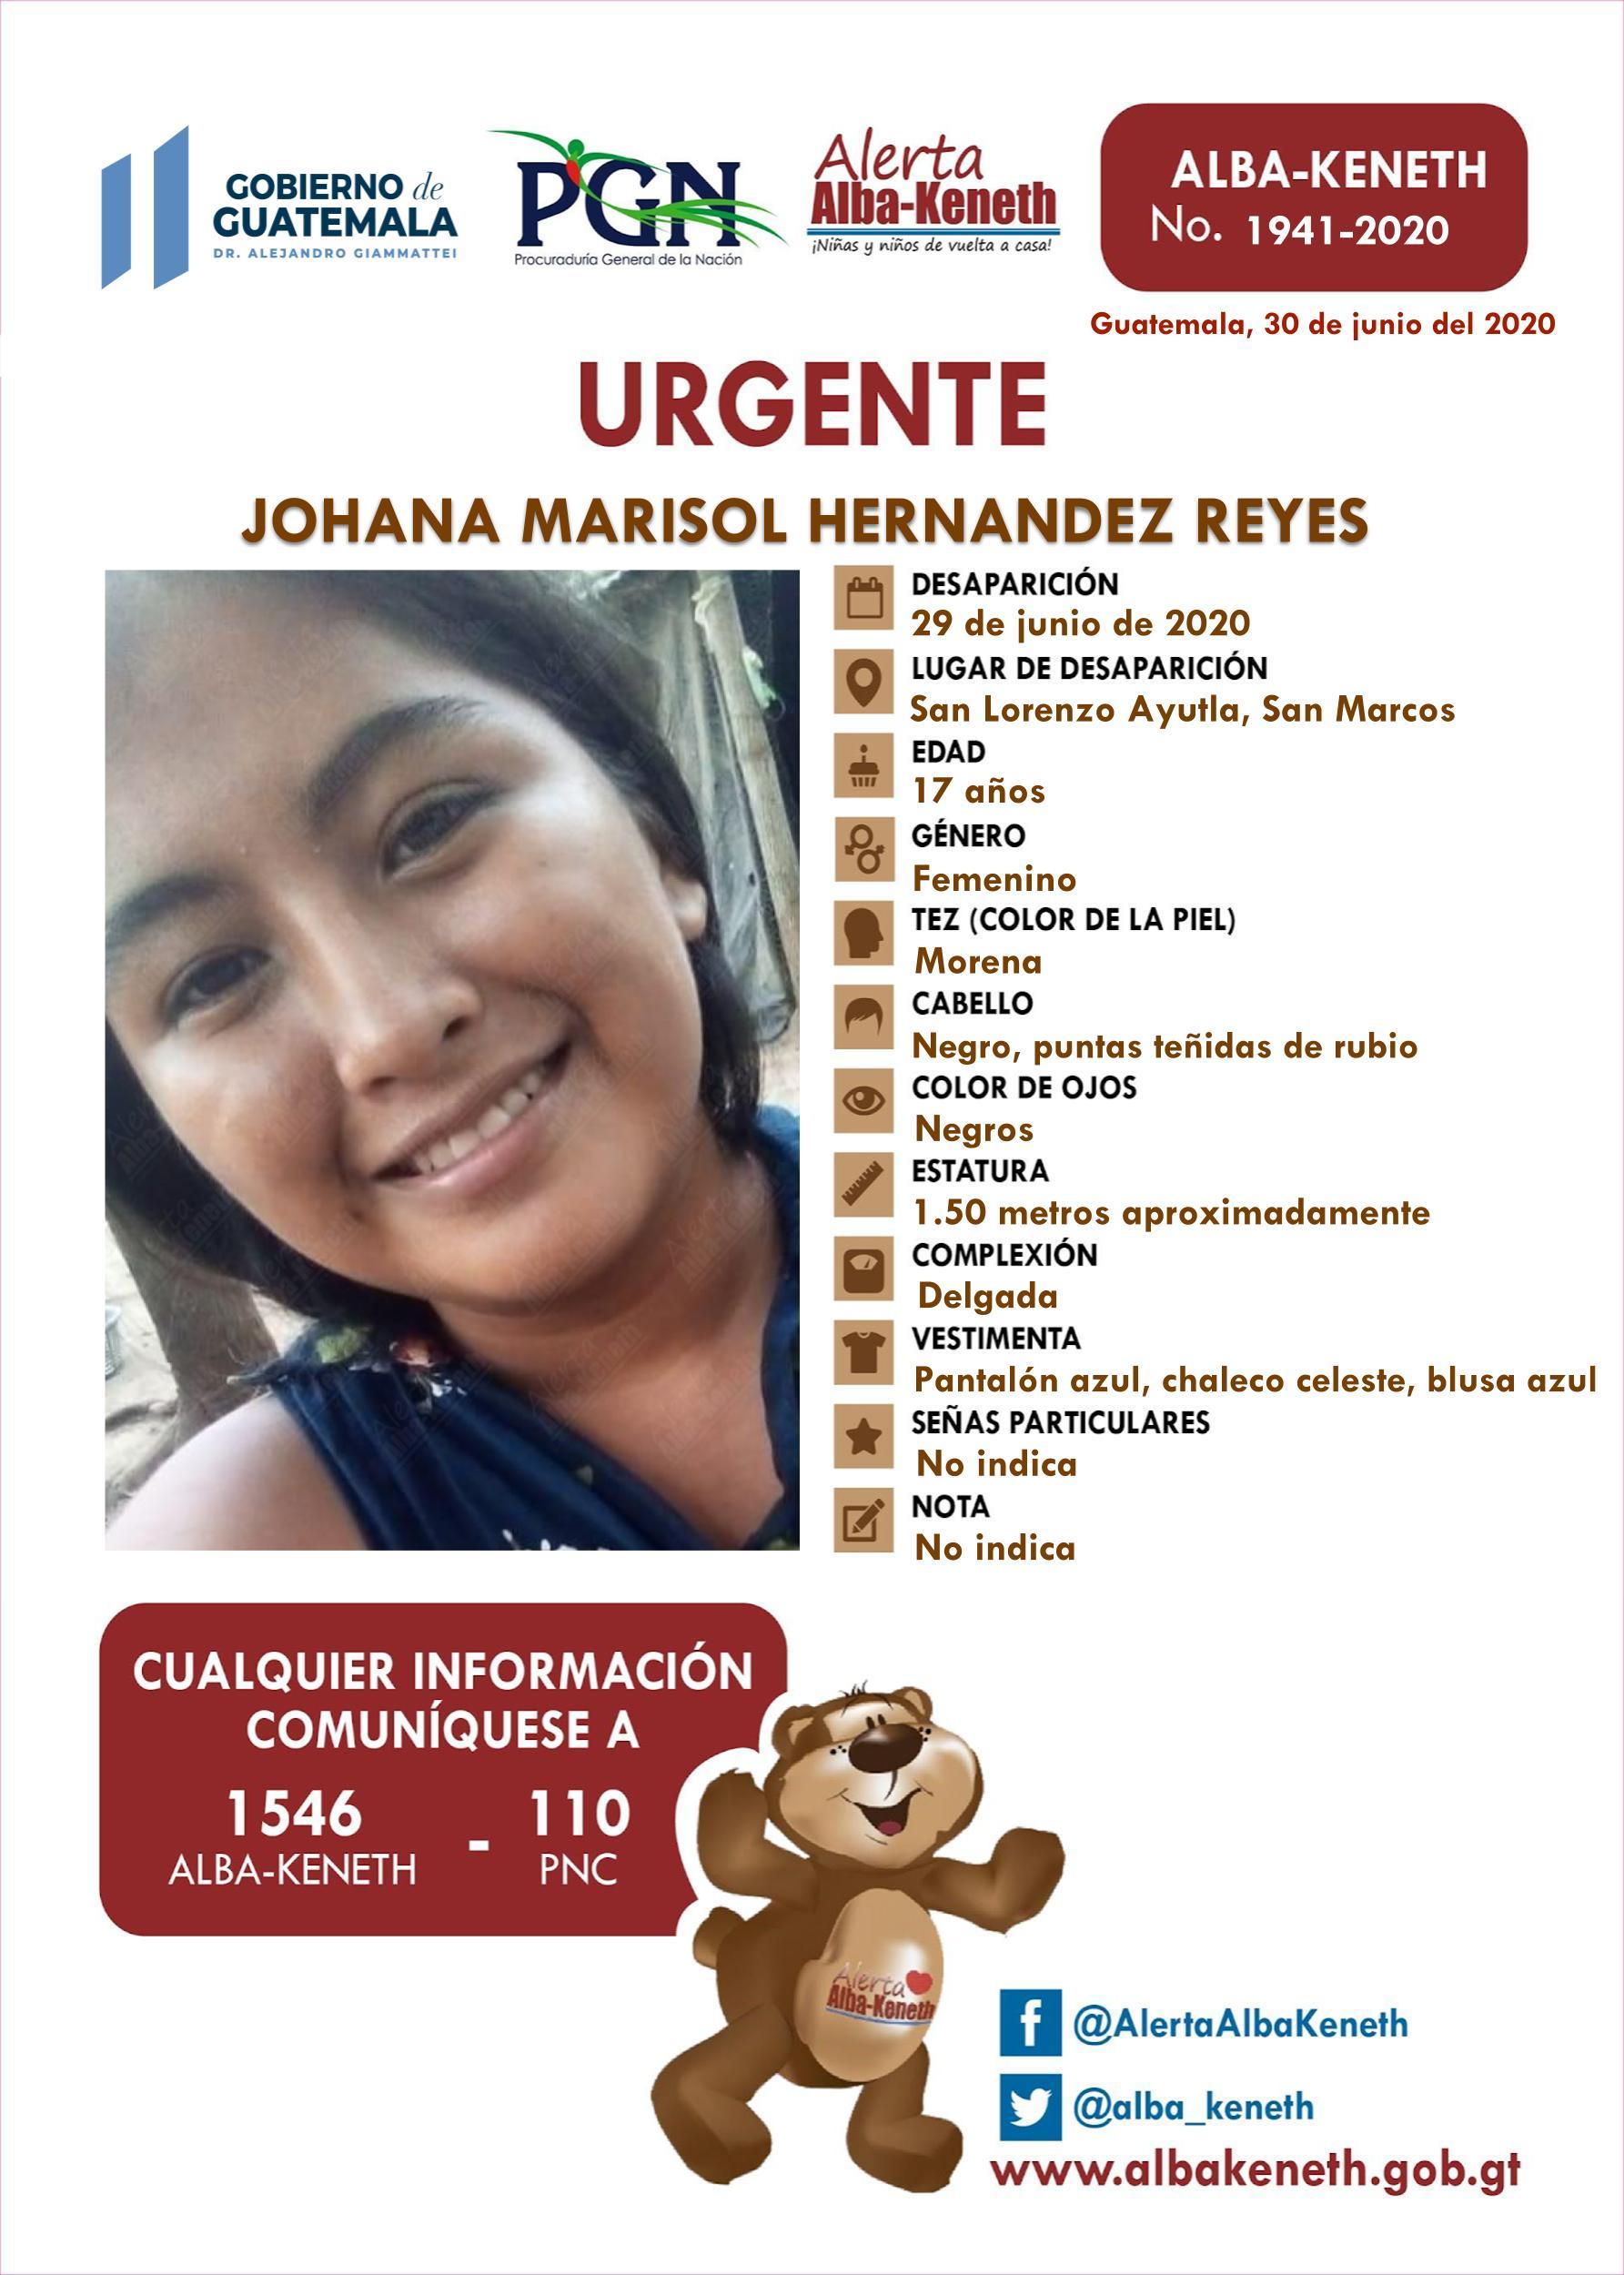 Johana Marisol Hernandez Reyes